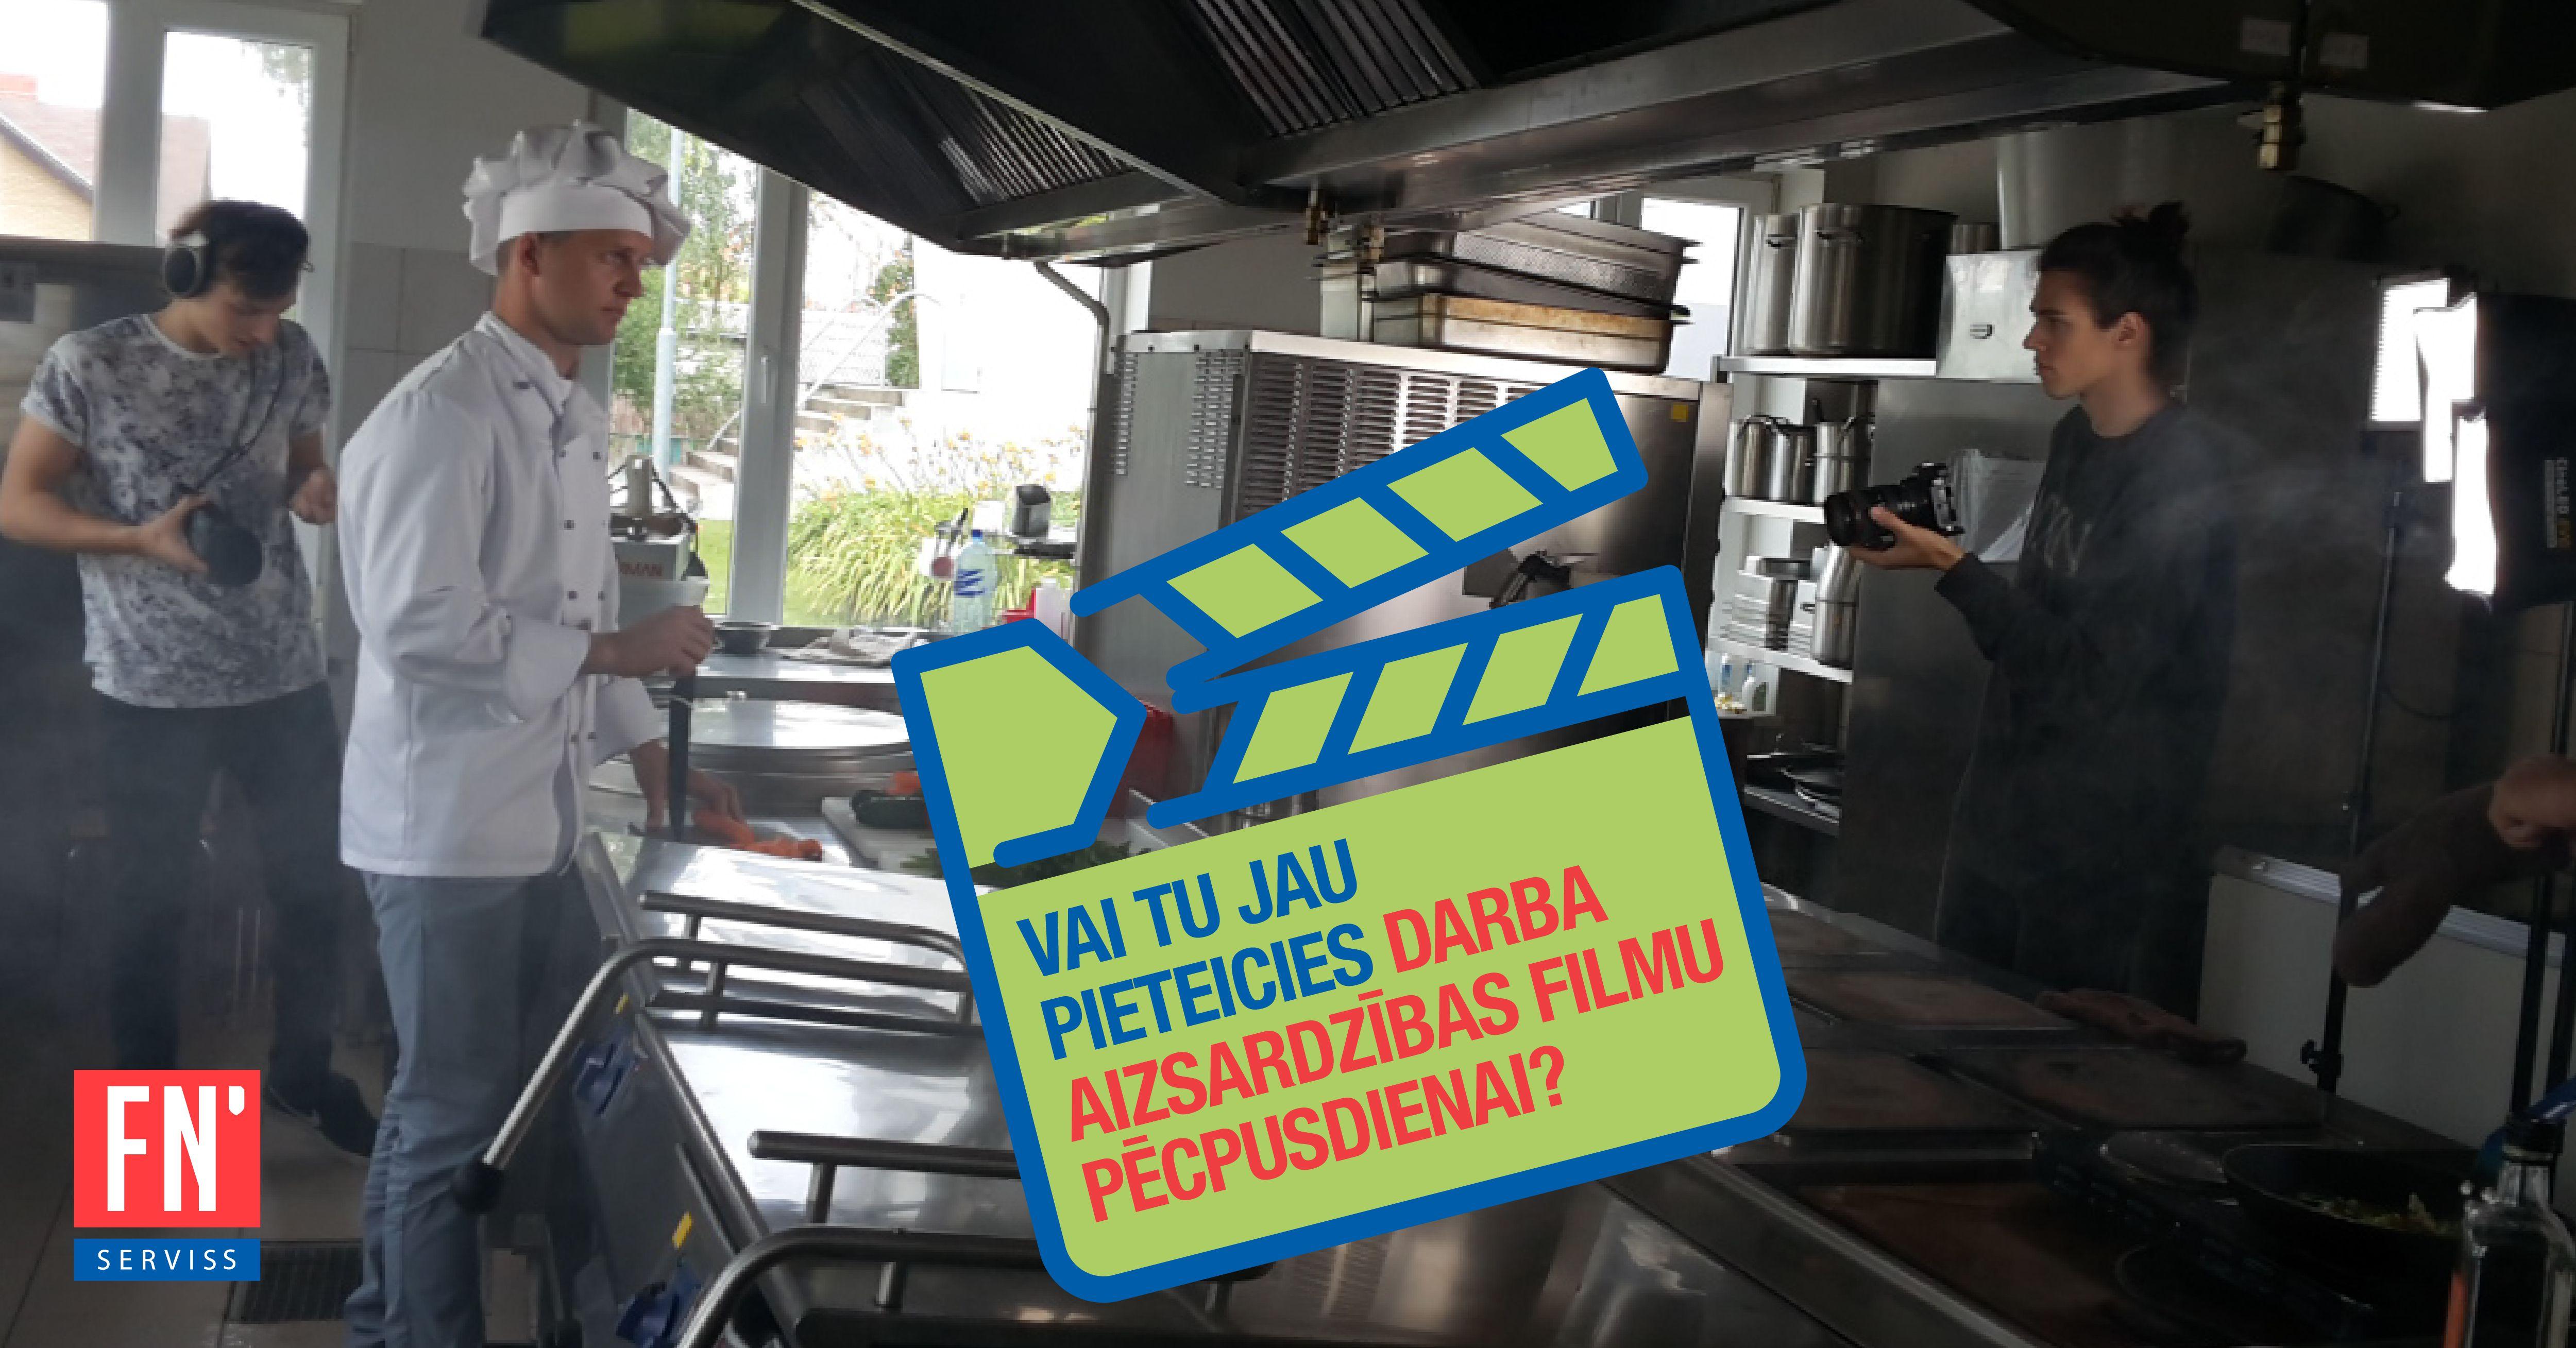 Lapa darba aizsardzības filmu pēcpusdiena